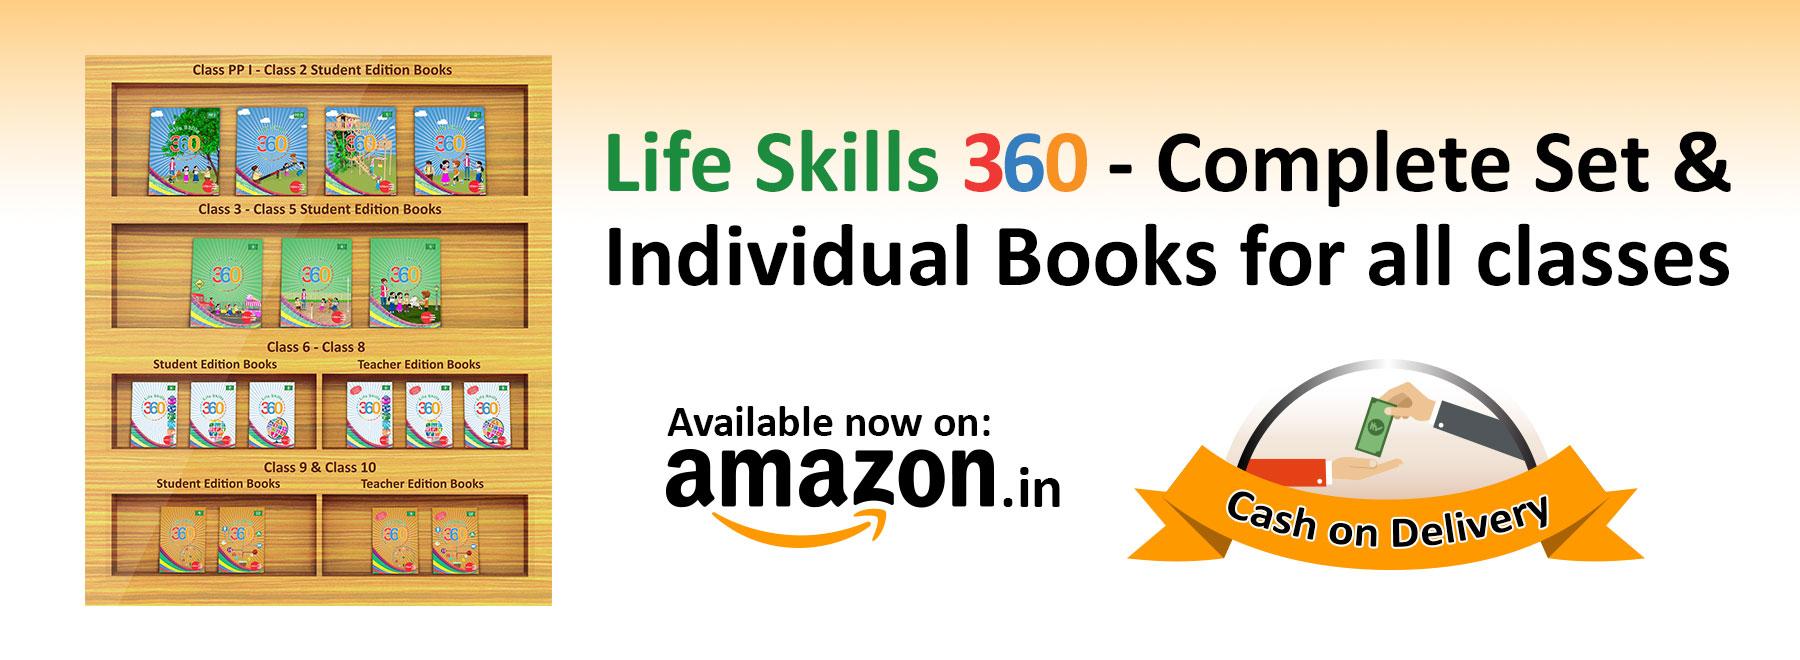 Life Skills 360 Amazon, life SKills, Lifeskills360, Amazon Books,